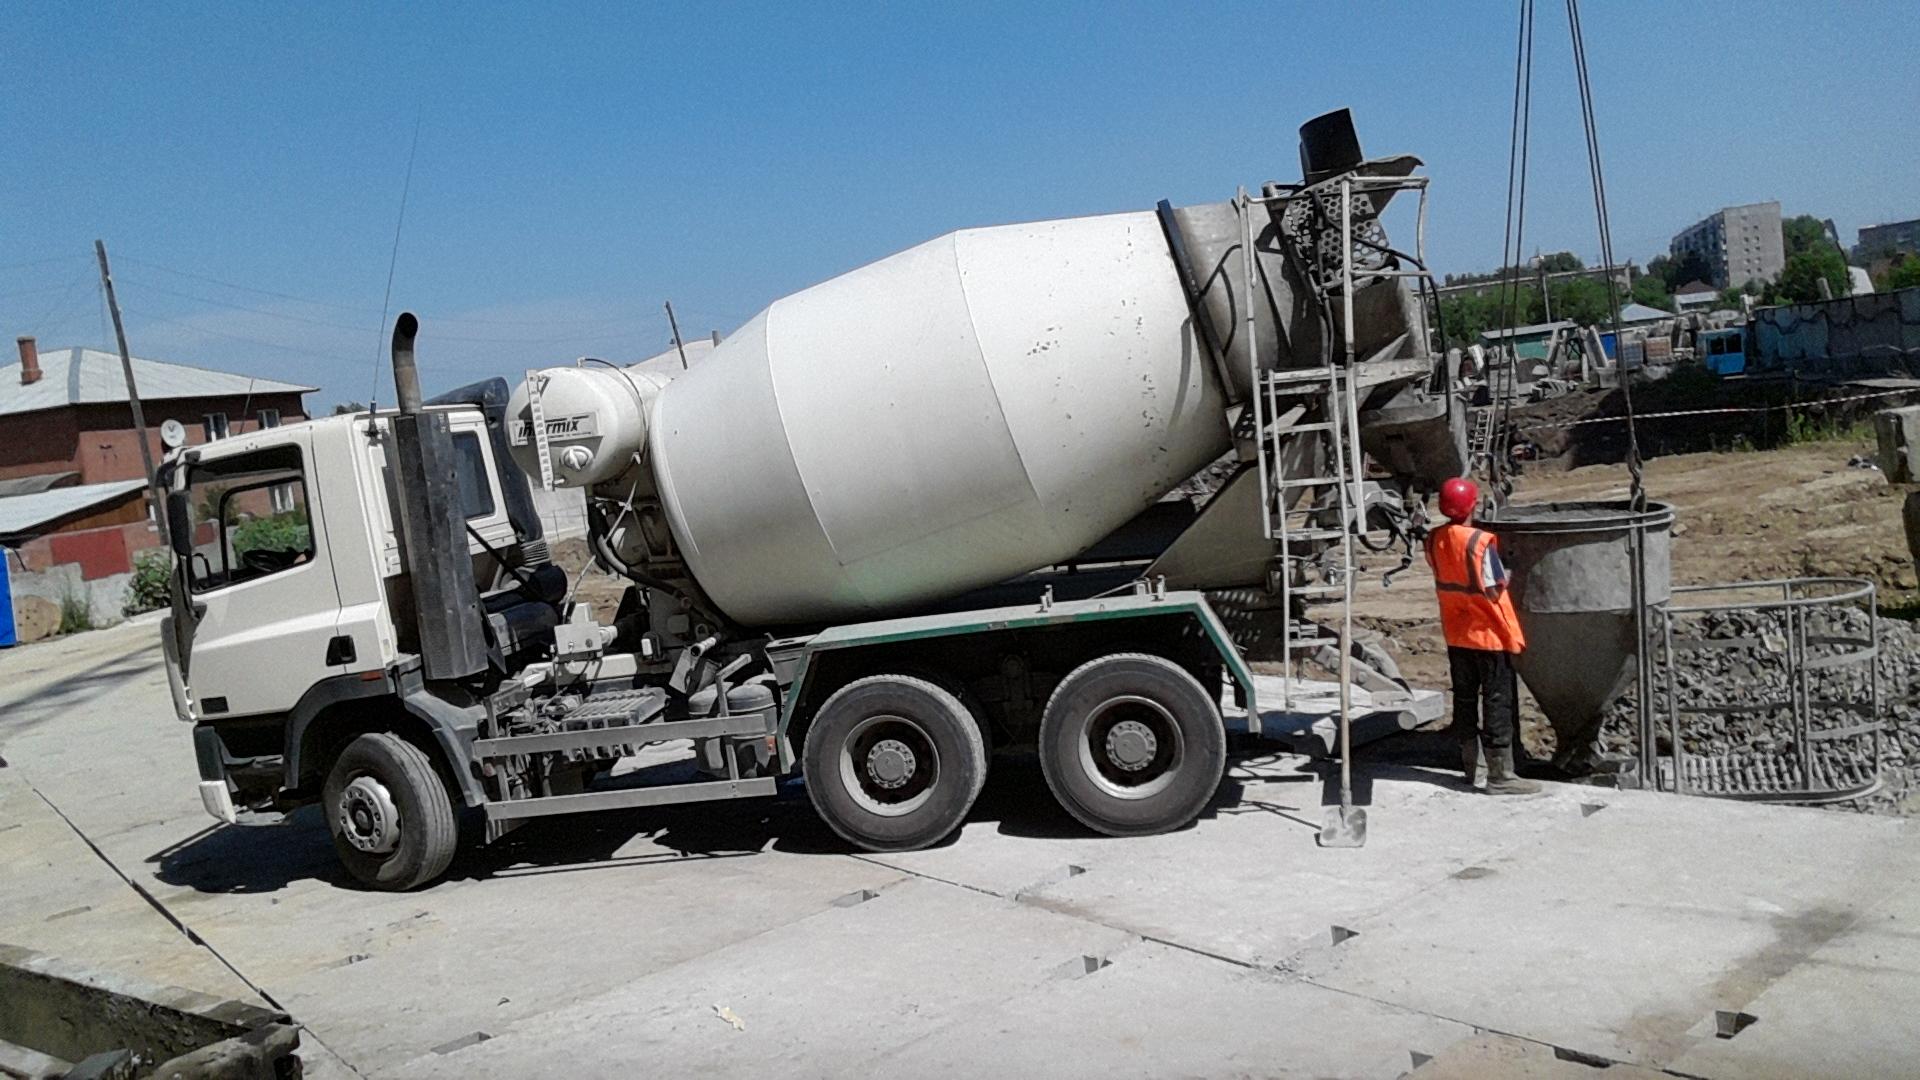 Купить бетон в асбесте бетон м250 москва цена